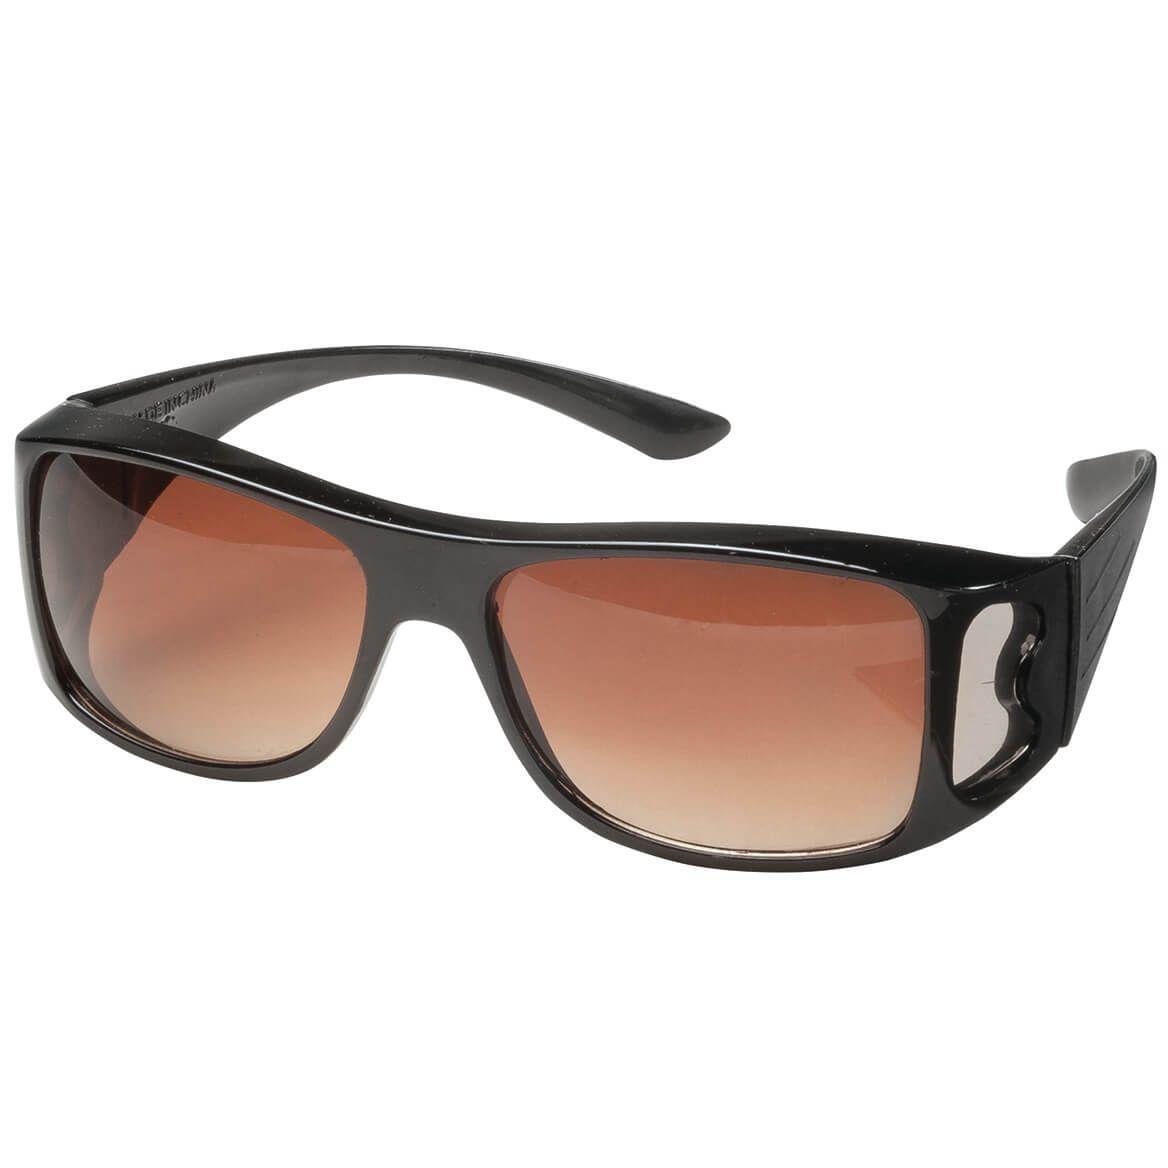 Clear View Wraparound Sunglasses-345672